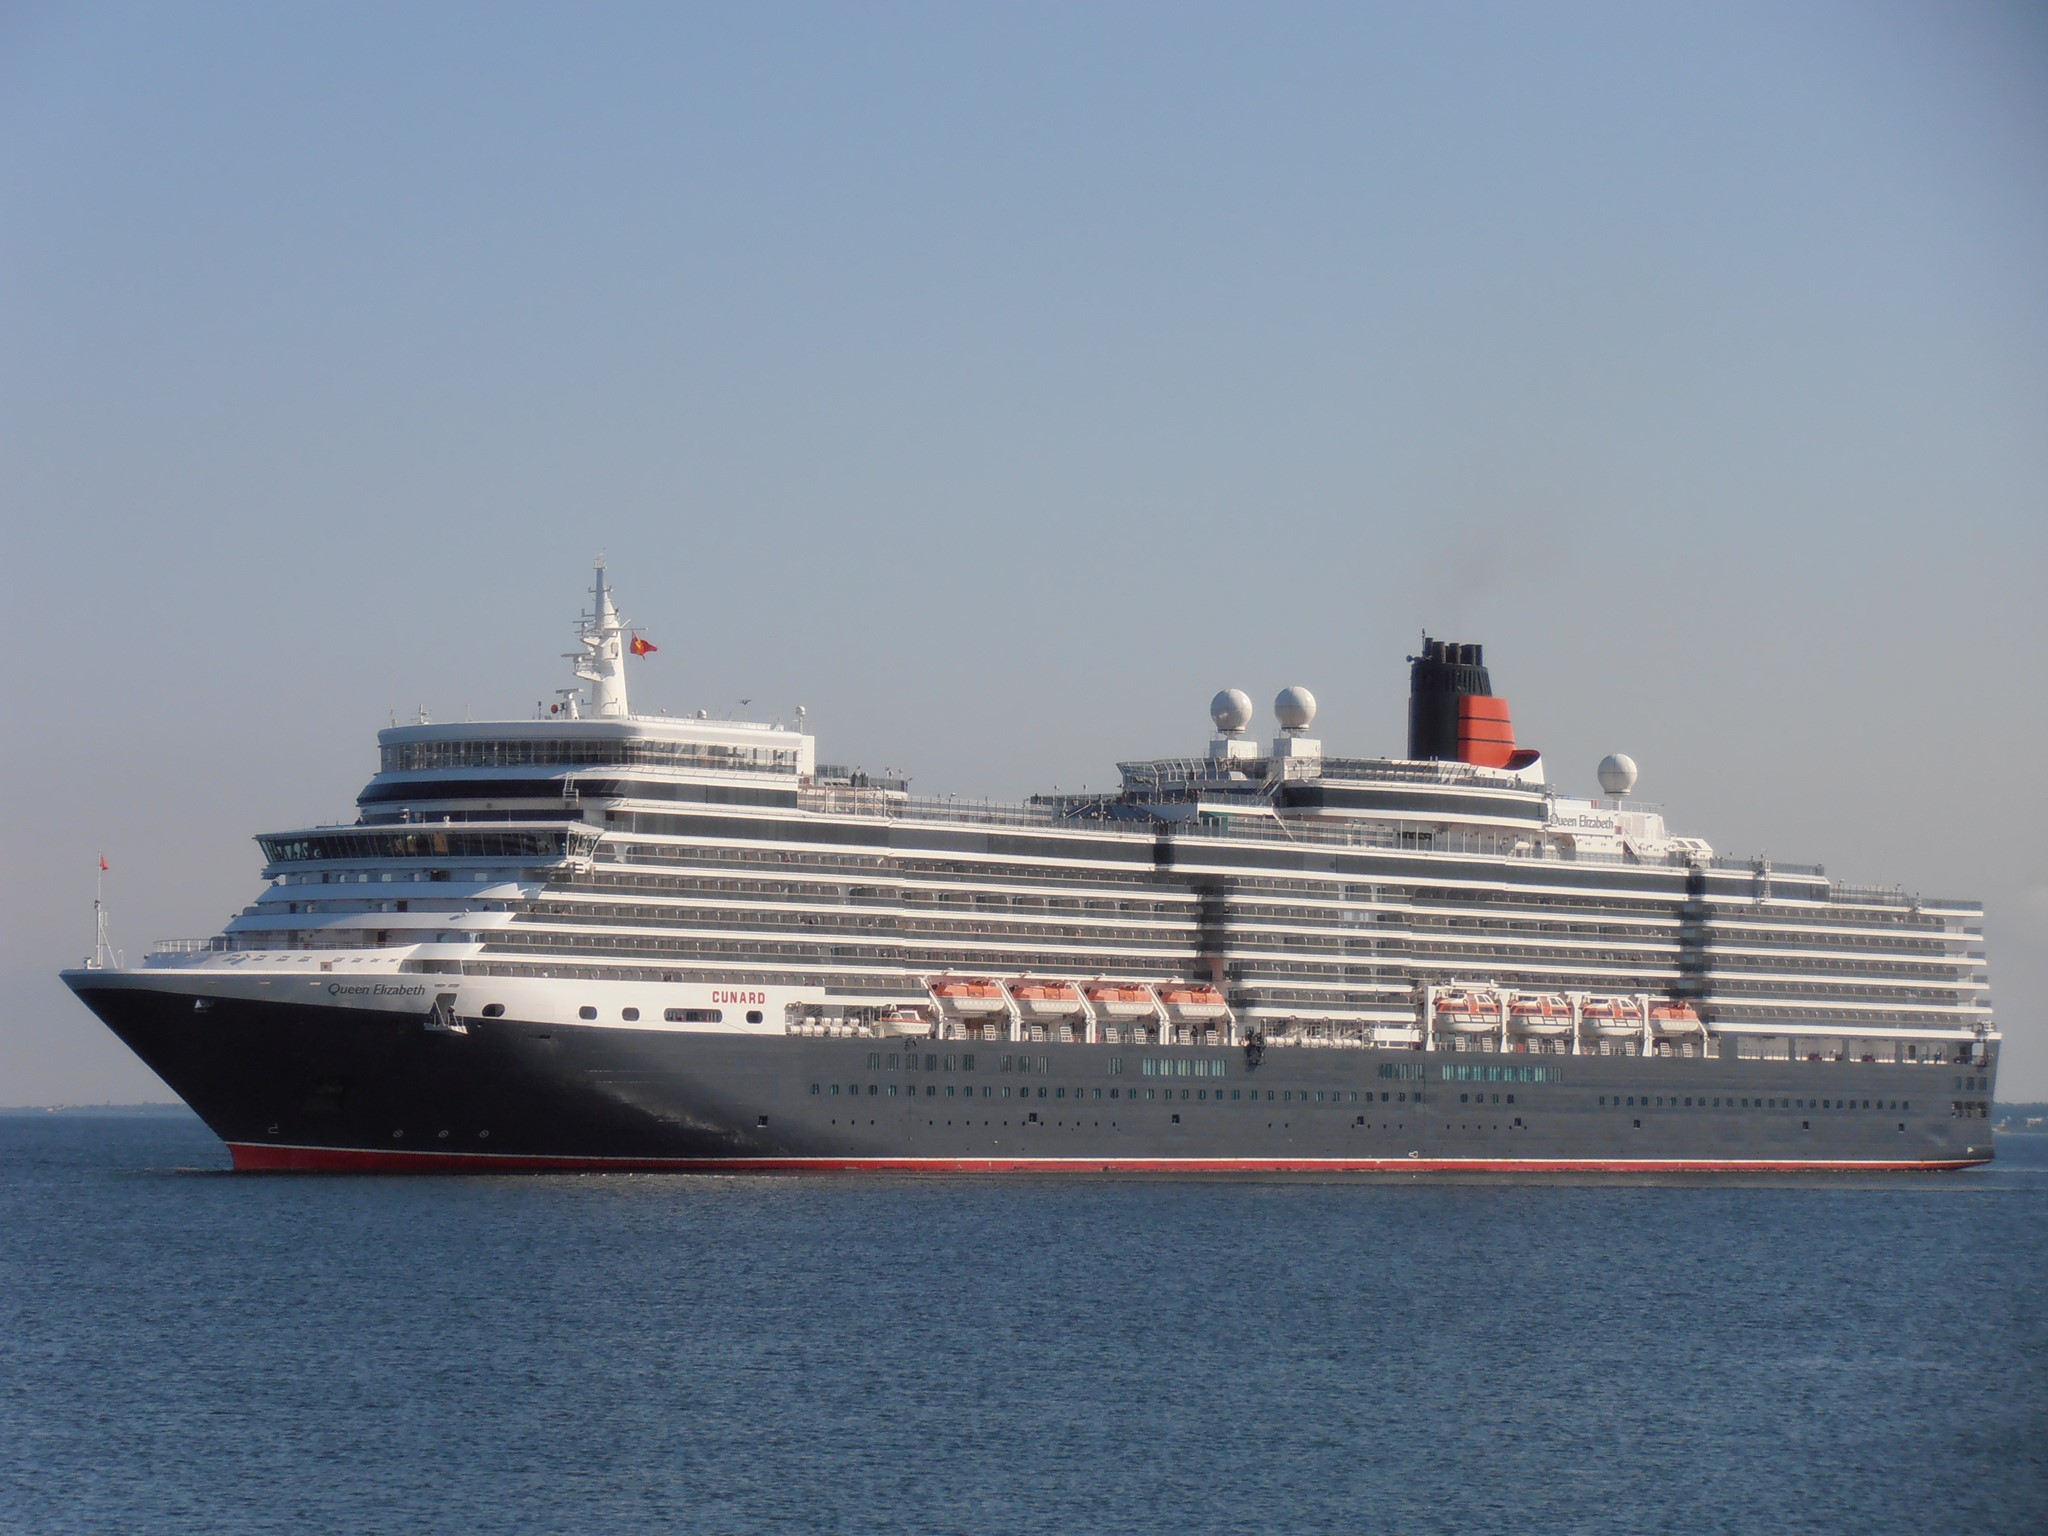 Cunard Line (Cruises)